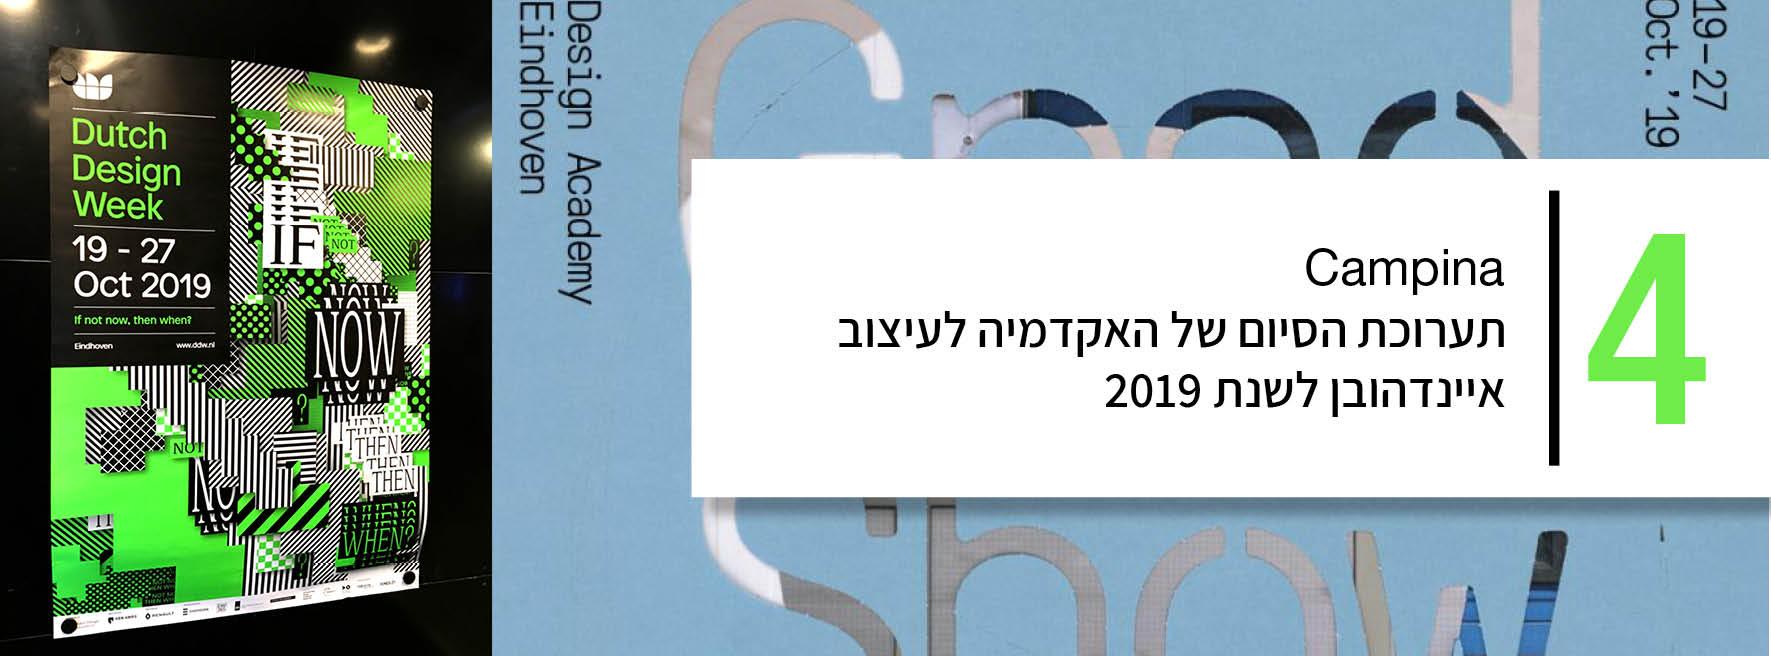 Campina. תערוכת הסיום של האקדמיה לעיצוב איינדהובן לשנת 2019